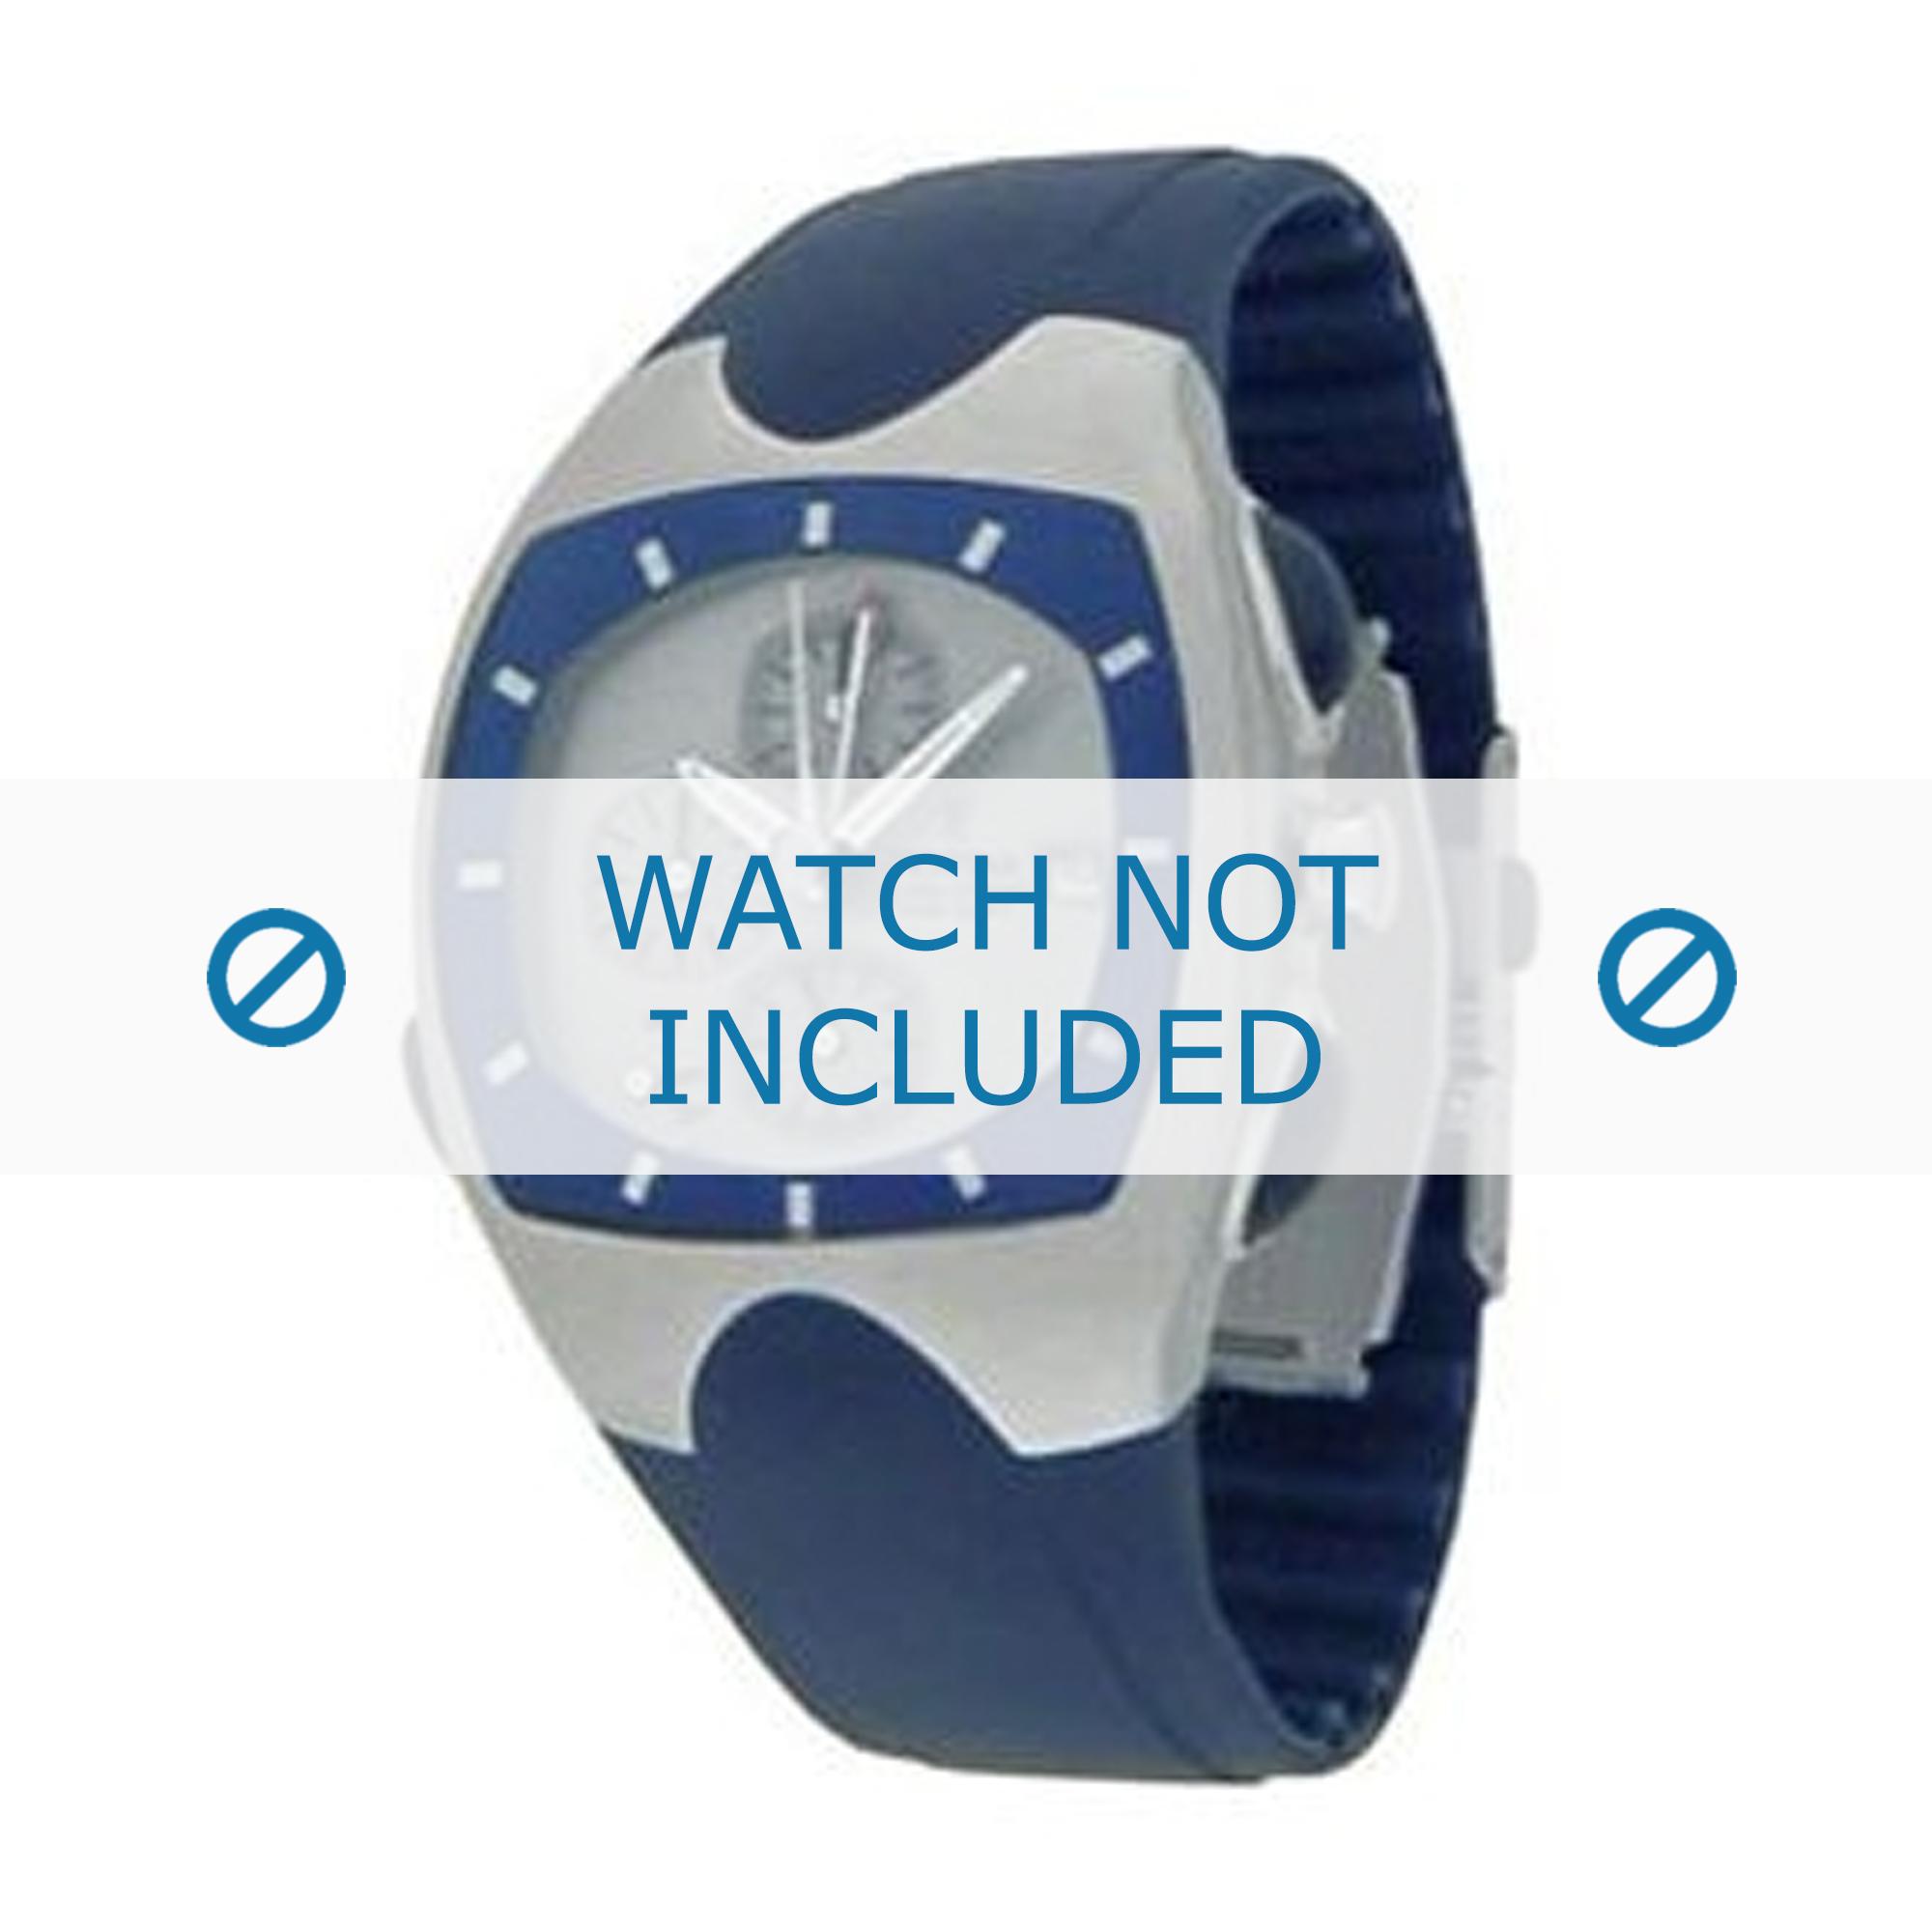 Festina horlogeband F16044.1 / F16044.2 / F16044.5 / F16044.6 Rubber Blauw 18mm